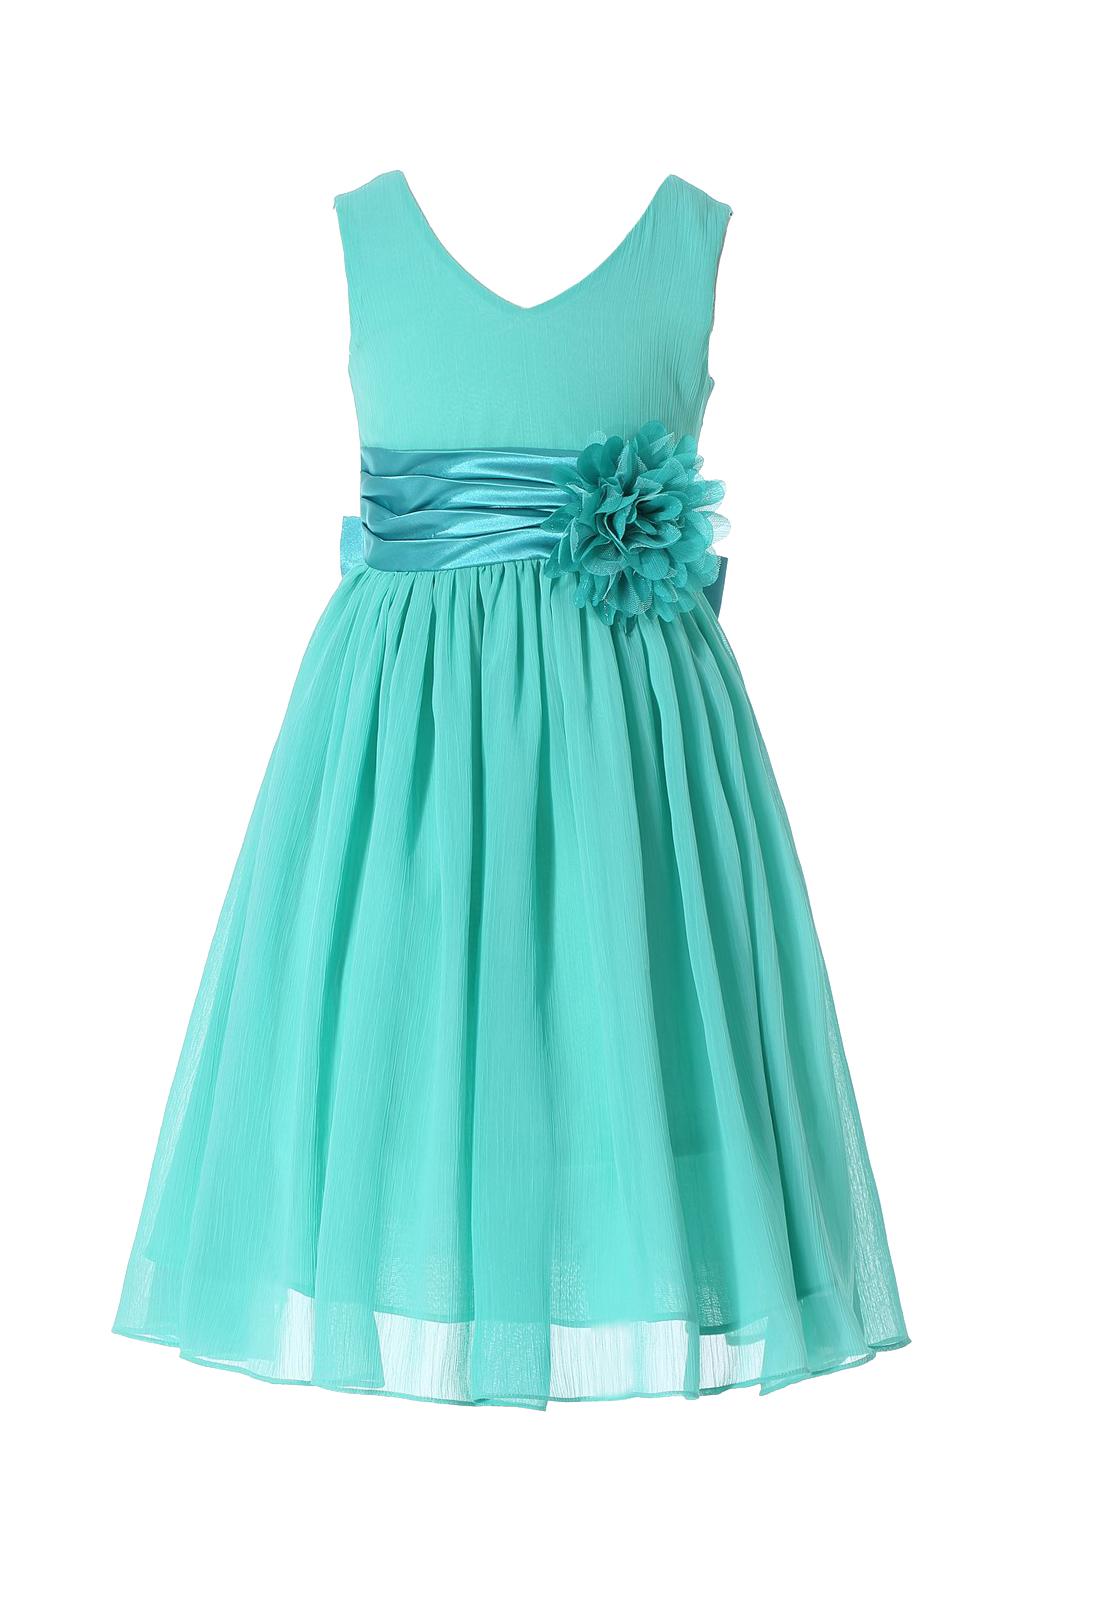 5513754e28c Bow Dream Turquoise 6 Pageant Flower Girl Dress sleeveless ...